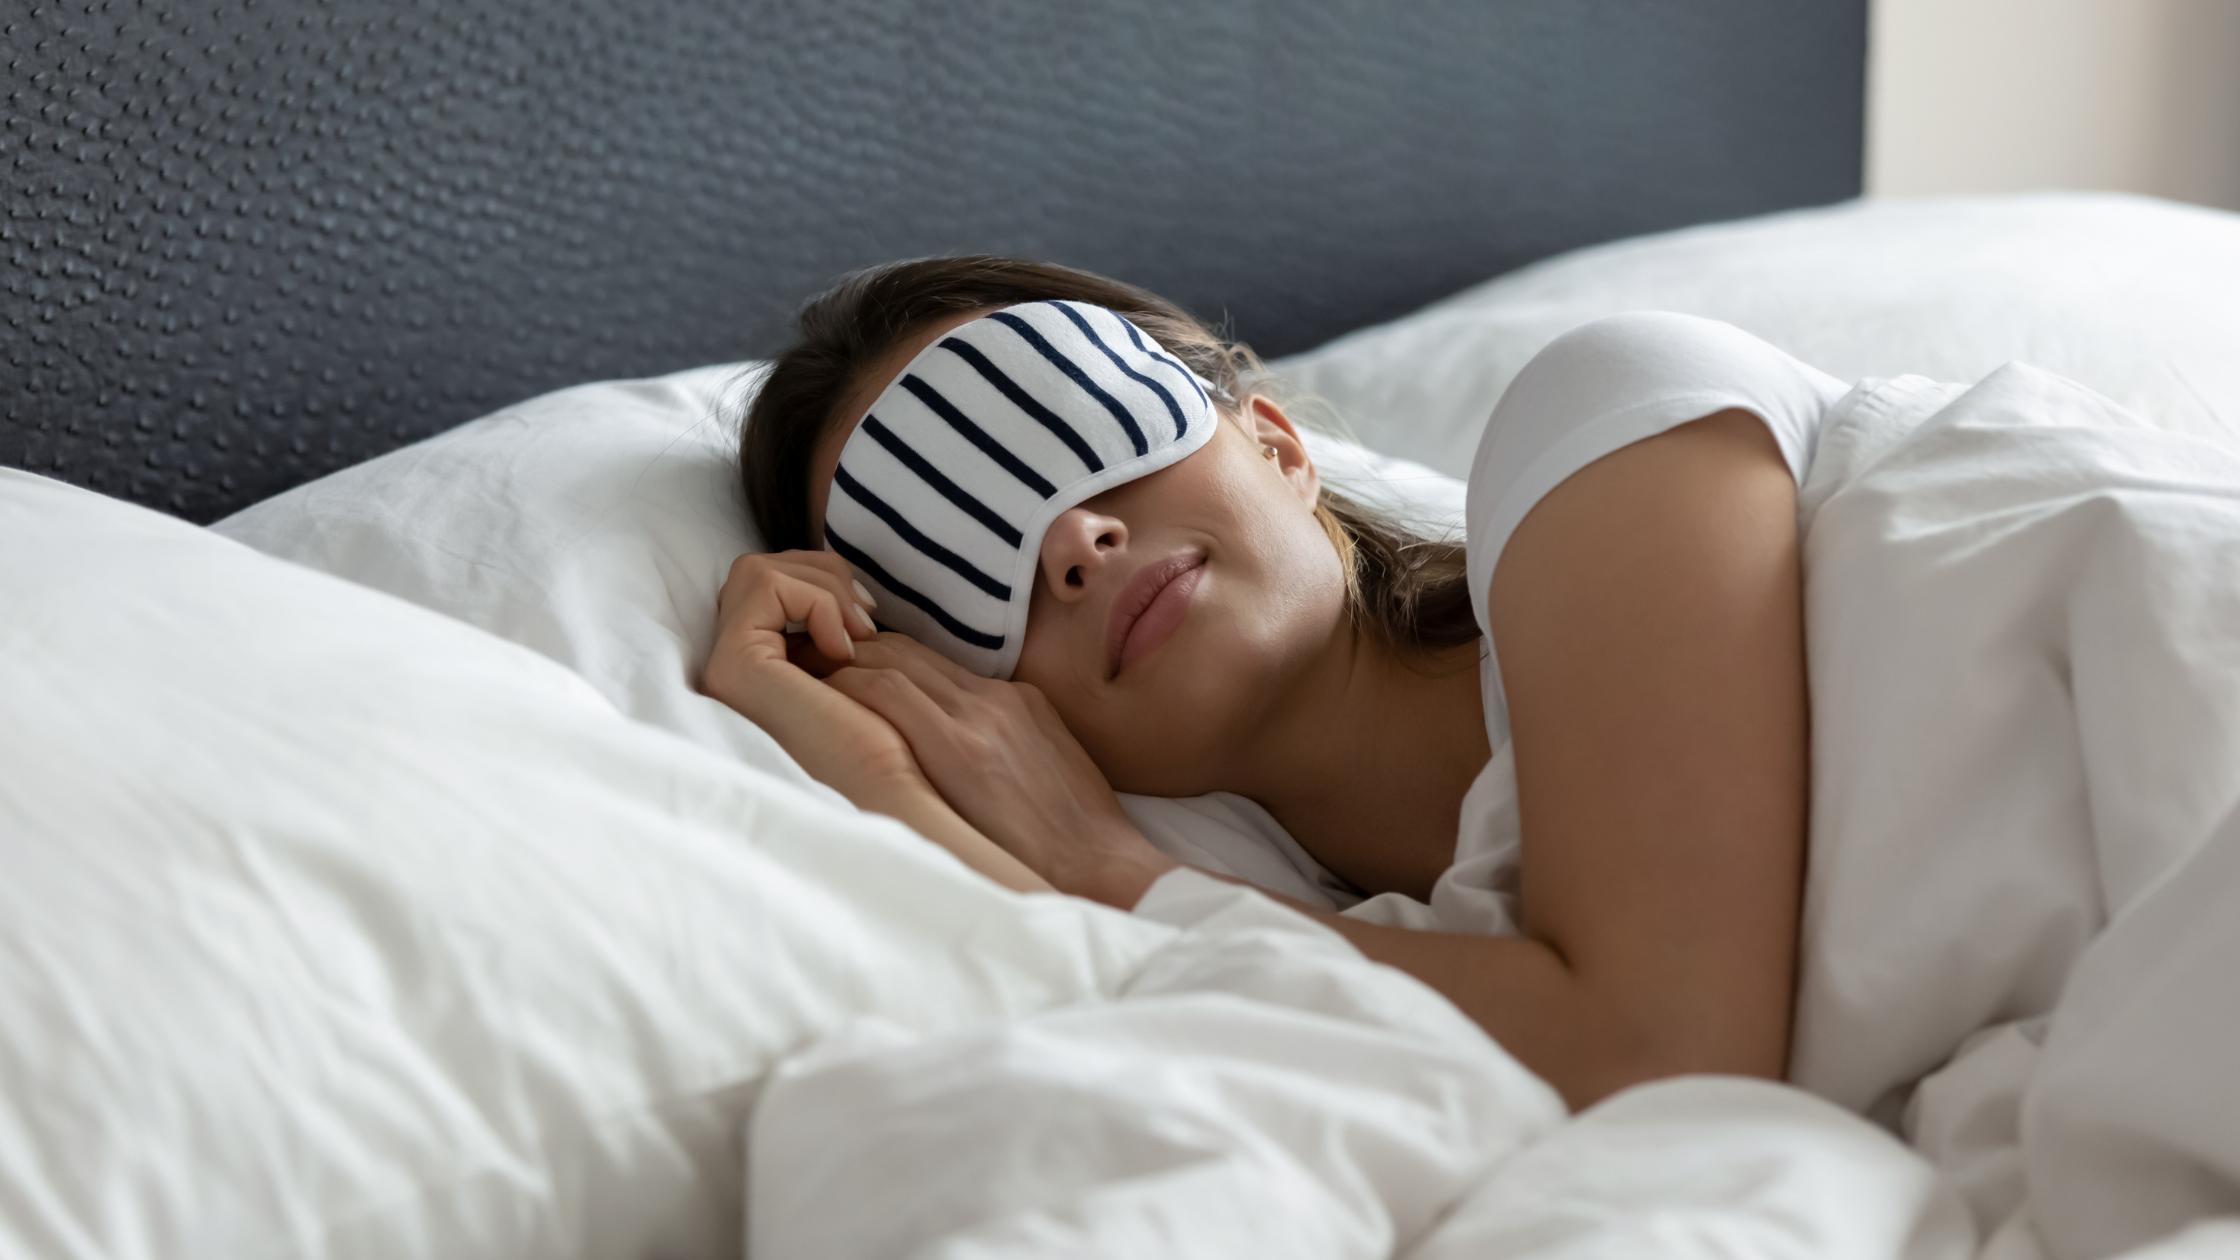 Reasons to get a good night's sleep